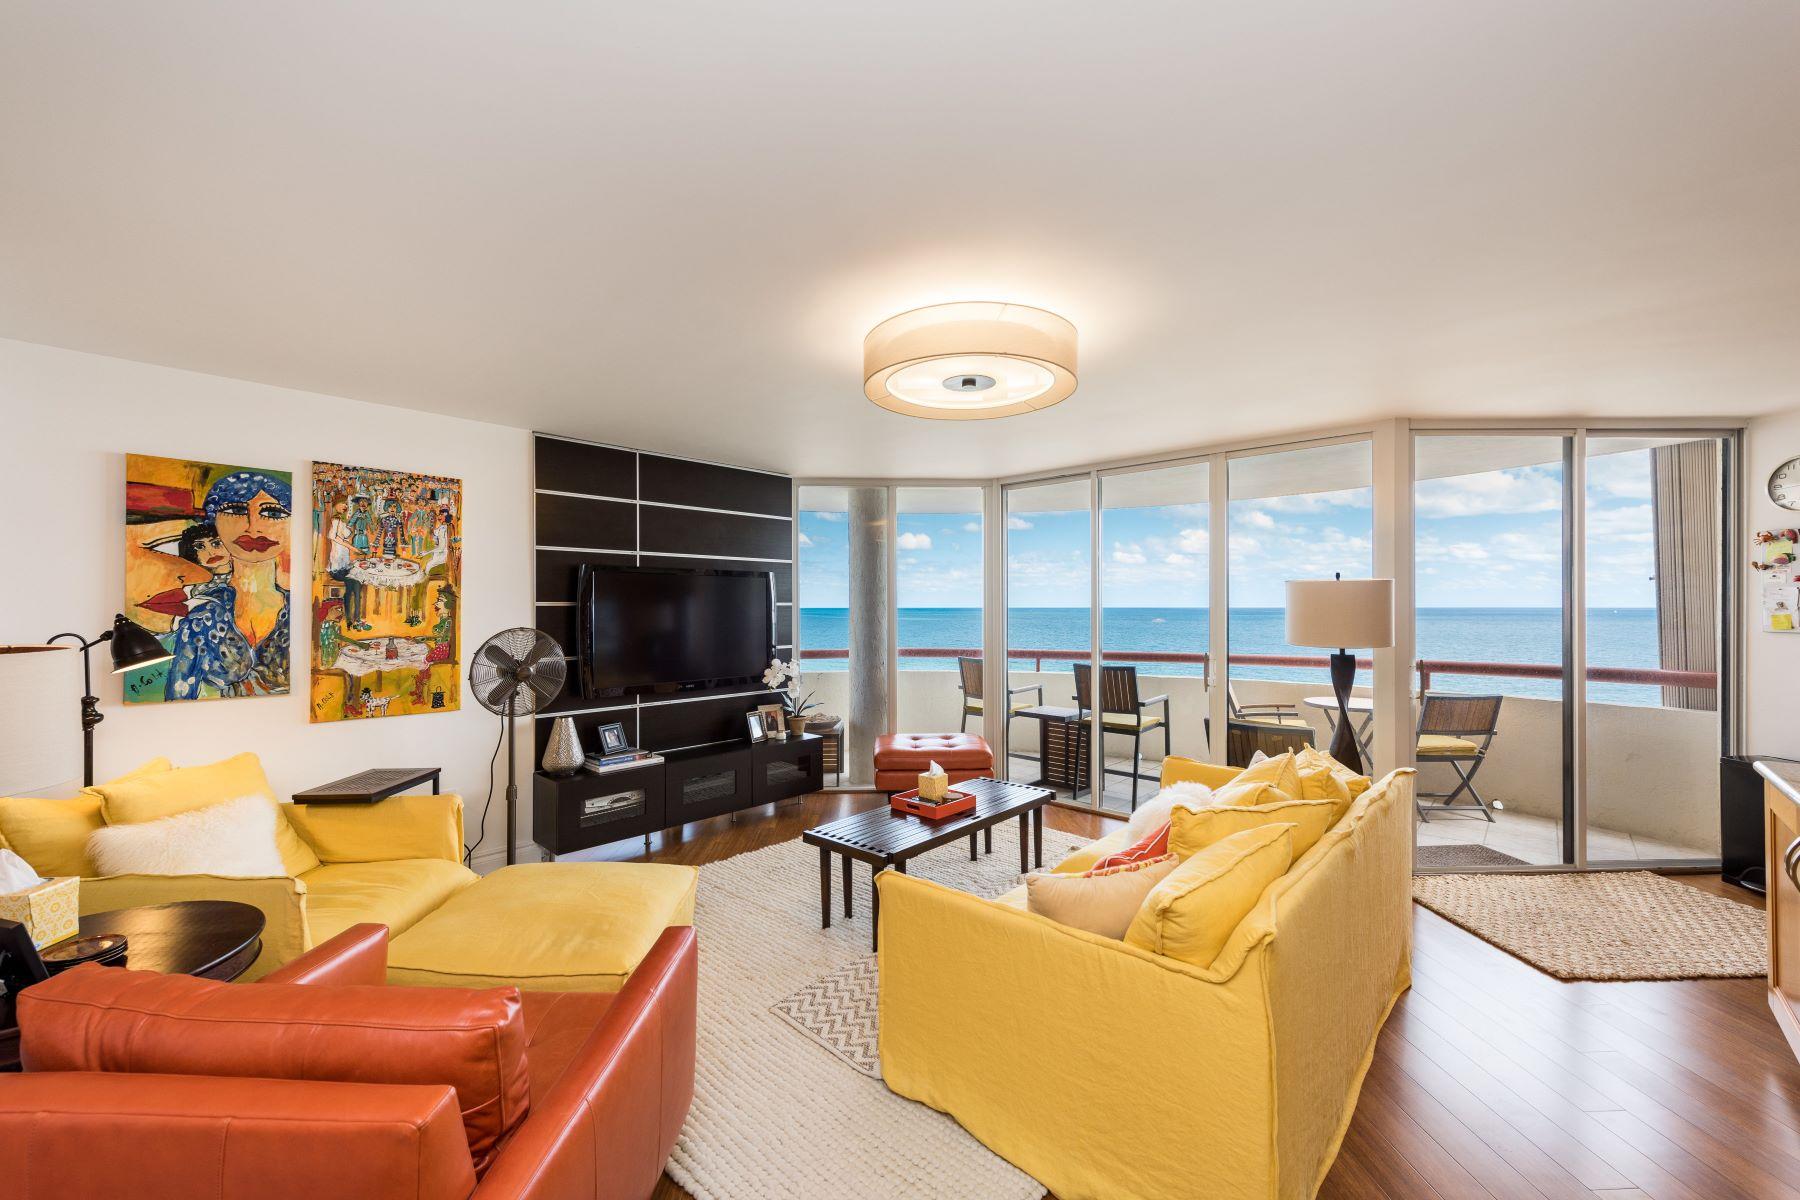 شقة بعمارة للـ Rent في 15645 Collins Ave #906 15645 Collins Ave 906, Sunny Isles Beach, Florida, 33160 United States